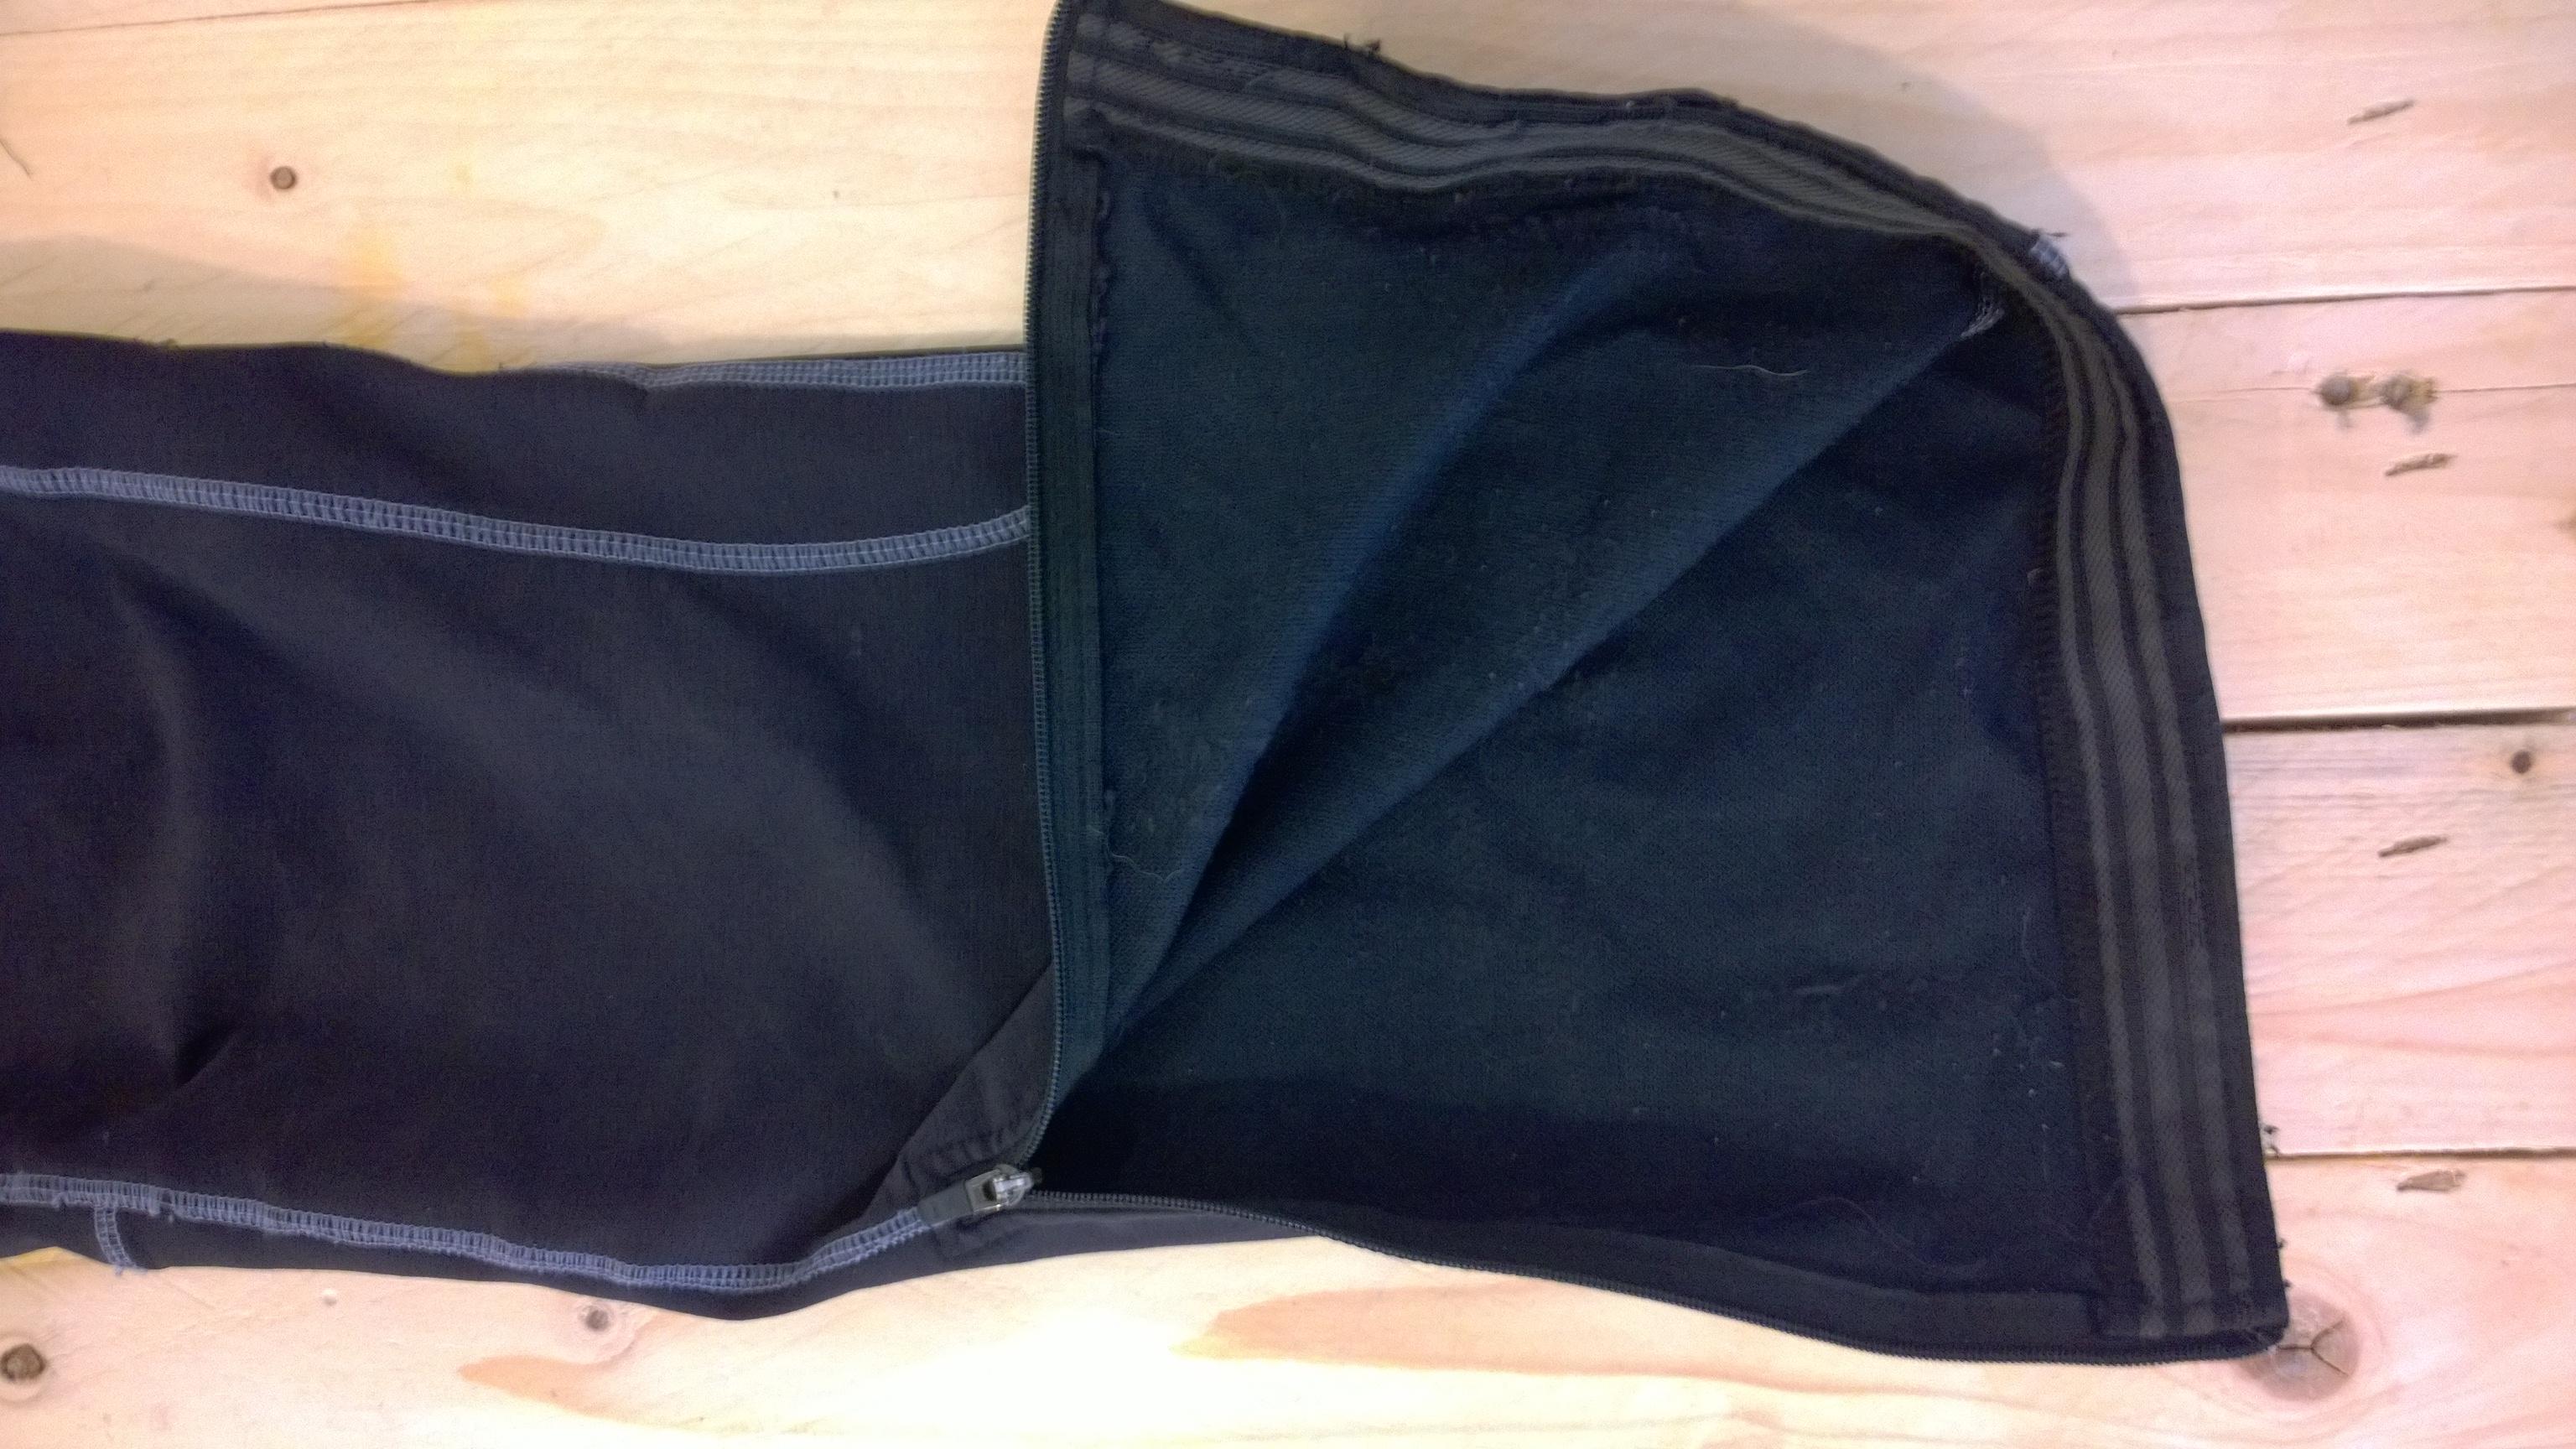 Outdoor recenzia: Elastické nohavice Ferrino Blouberg a elastický límec